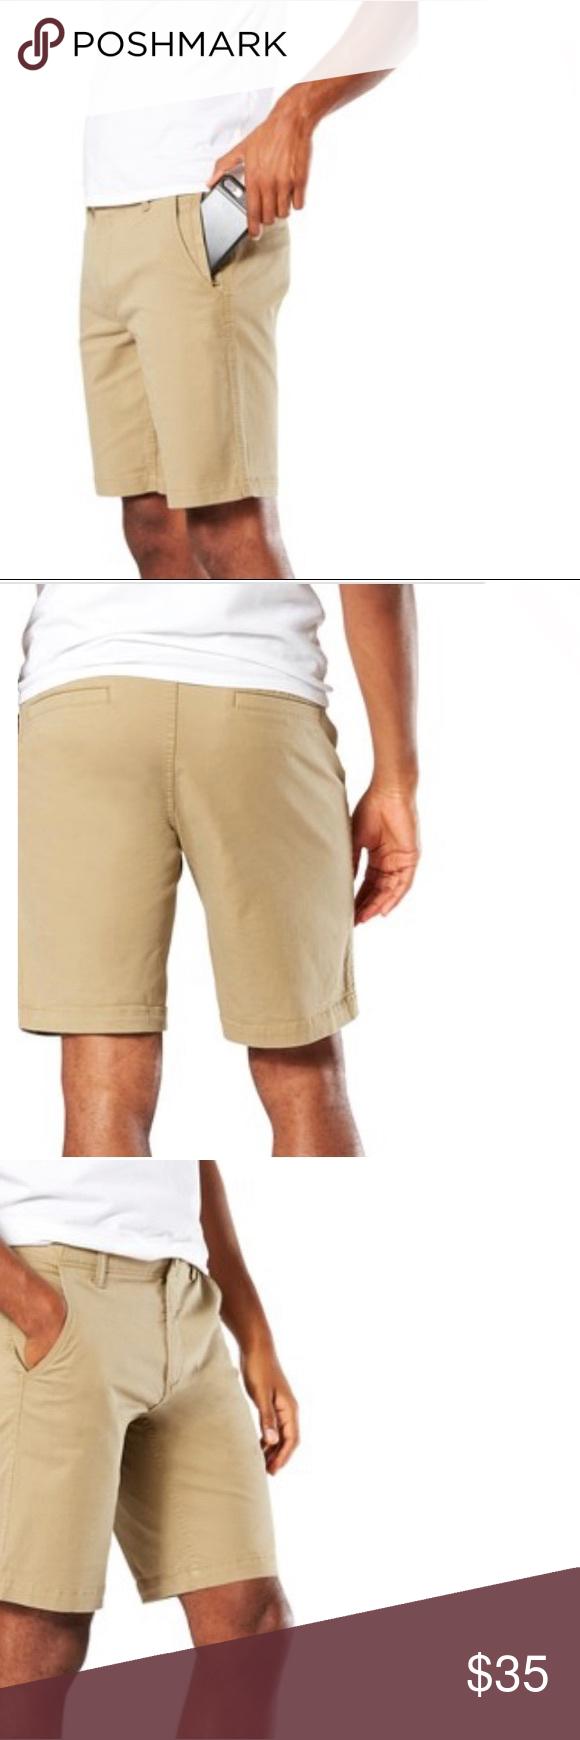 3d921a1fa713 Dockers Smart 360 FLEX Straight-Fit Shorts Men's Dockers® Smart 360 FLEX  Straight-